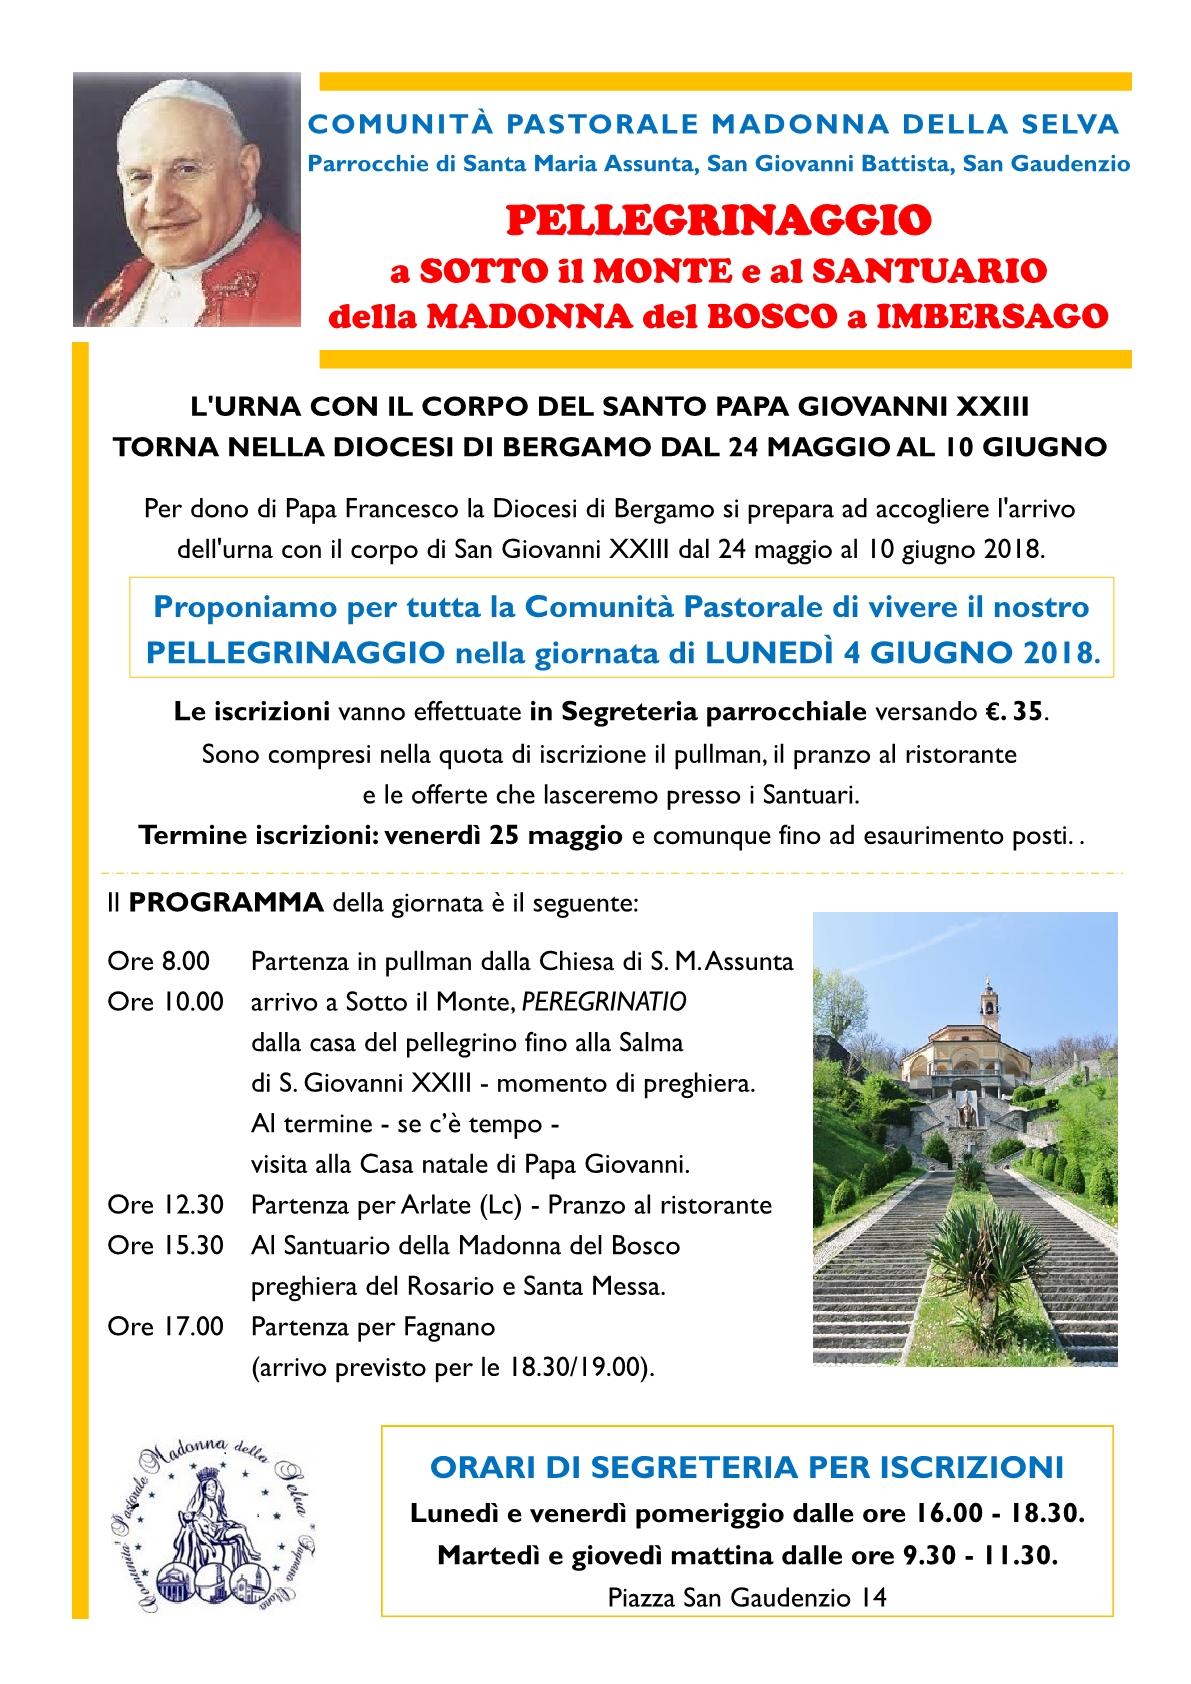 Giovanni-XXIII-e-Imbersago1